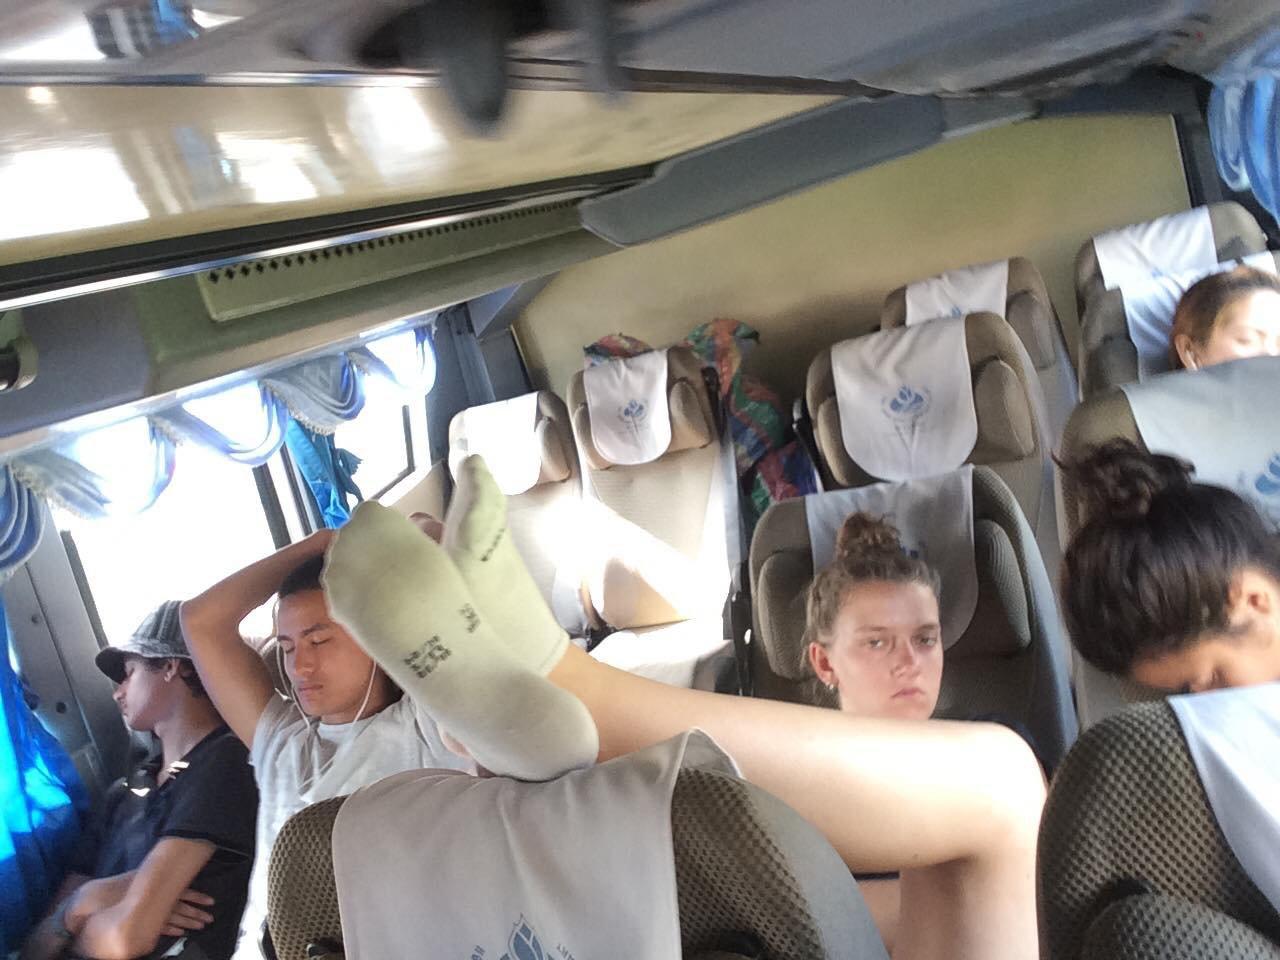 rancid backpacker feet.jpg